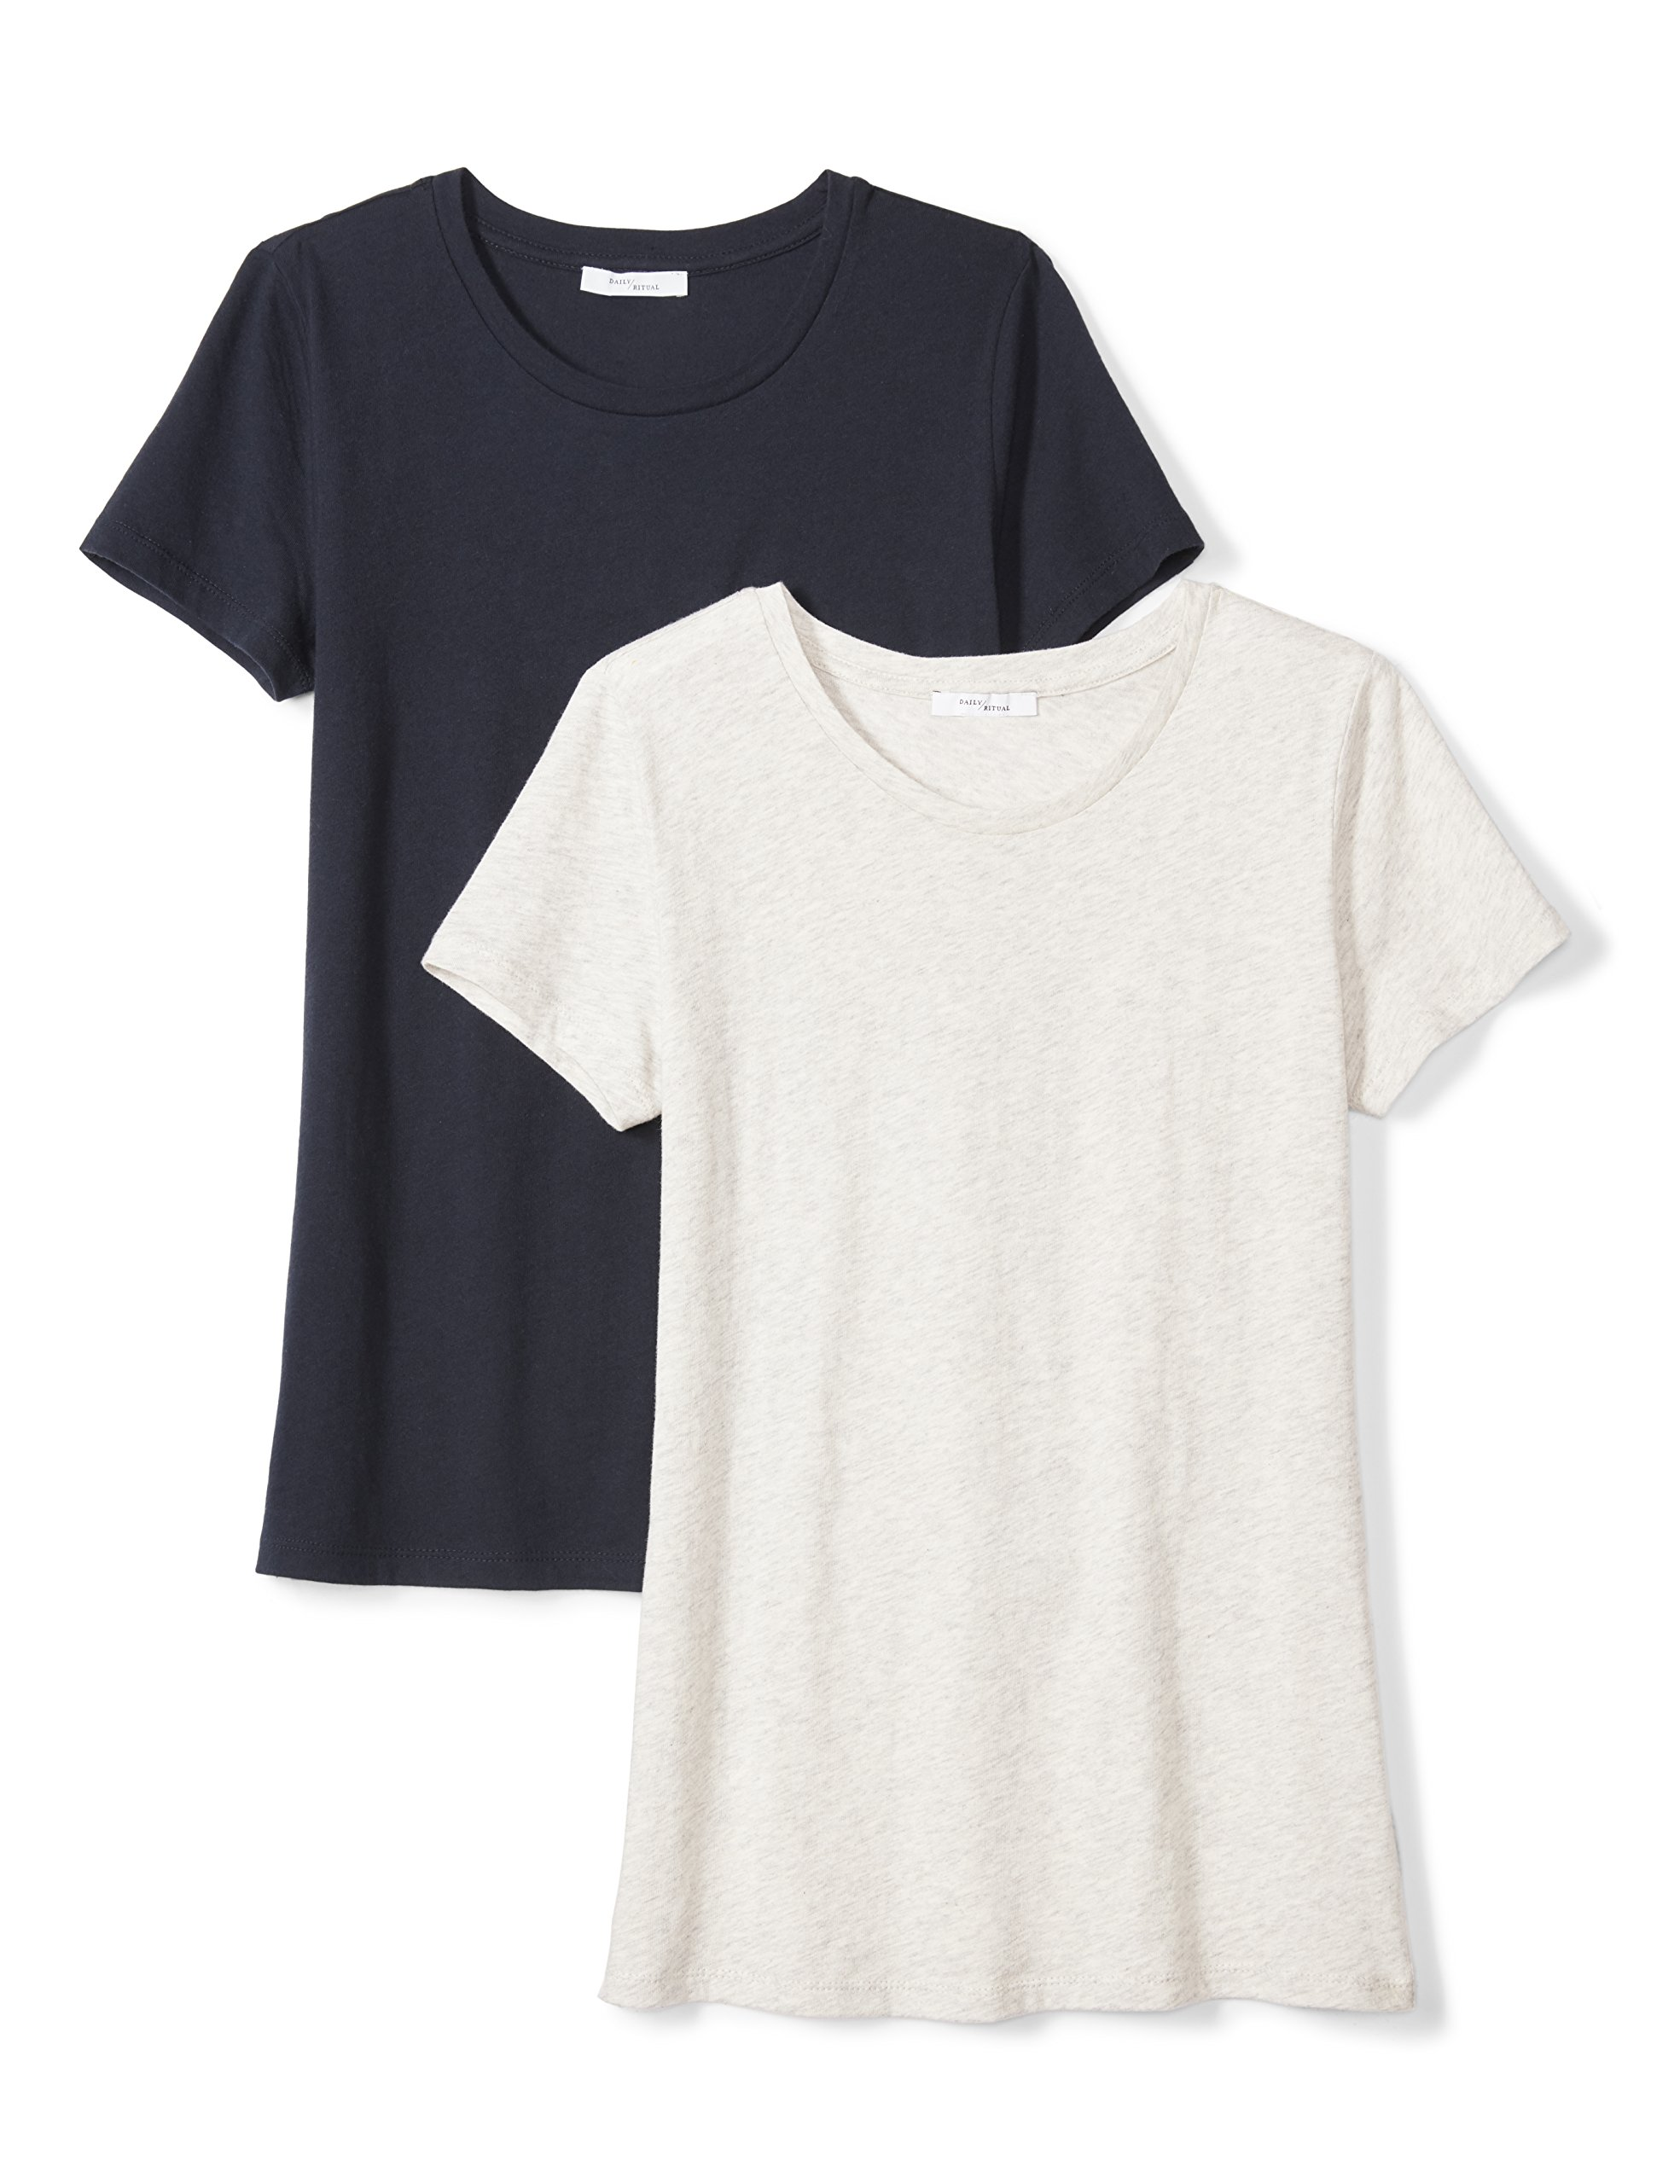 Daily Ritual Women's Tissue Cotton Short-Sleeve Crew Neck T-Shirt, 2-Pack, XL, Heather Grey/Navy